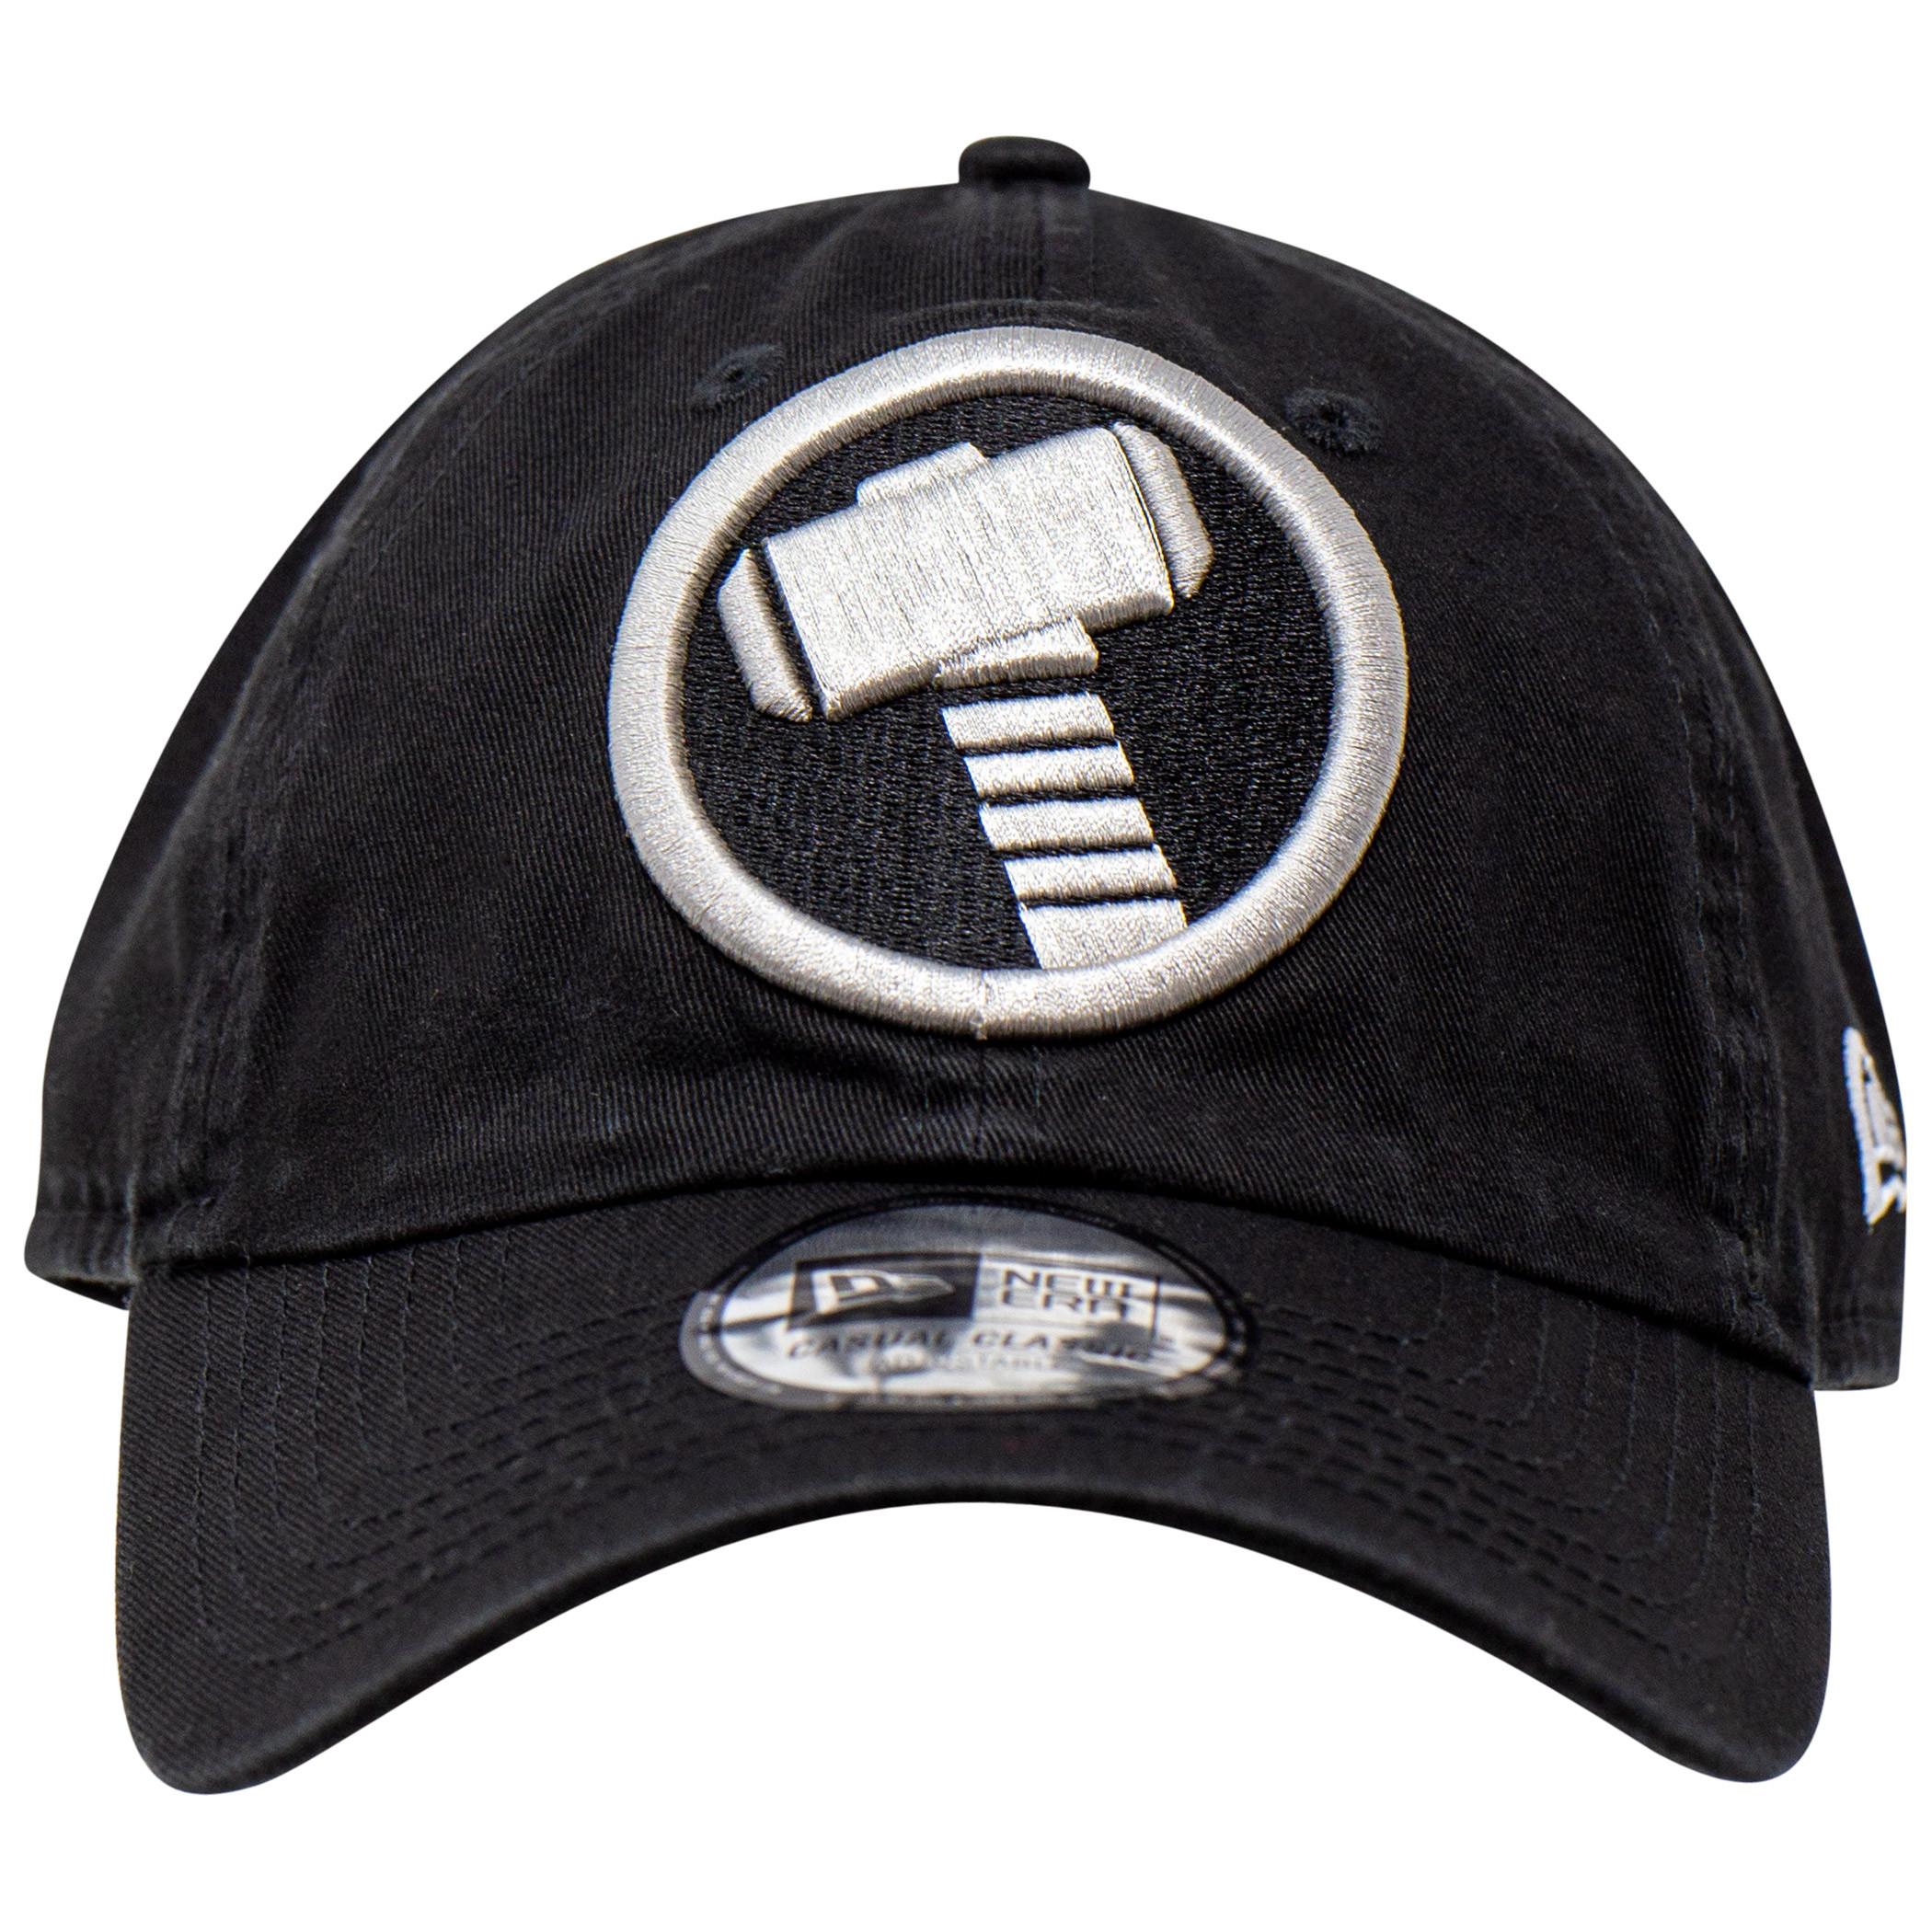 Thor Hammer Symbol New Era Casual Classic Adjustable Dad Hat